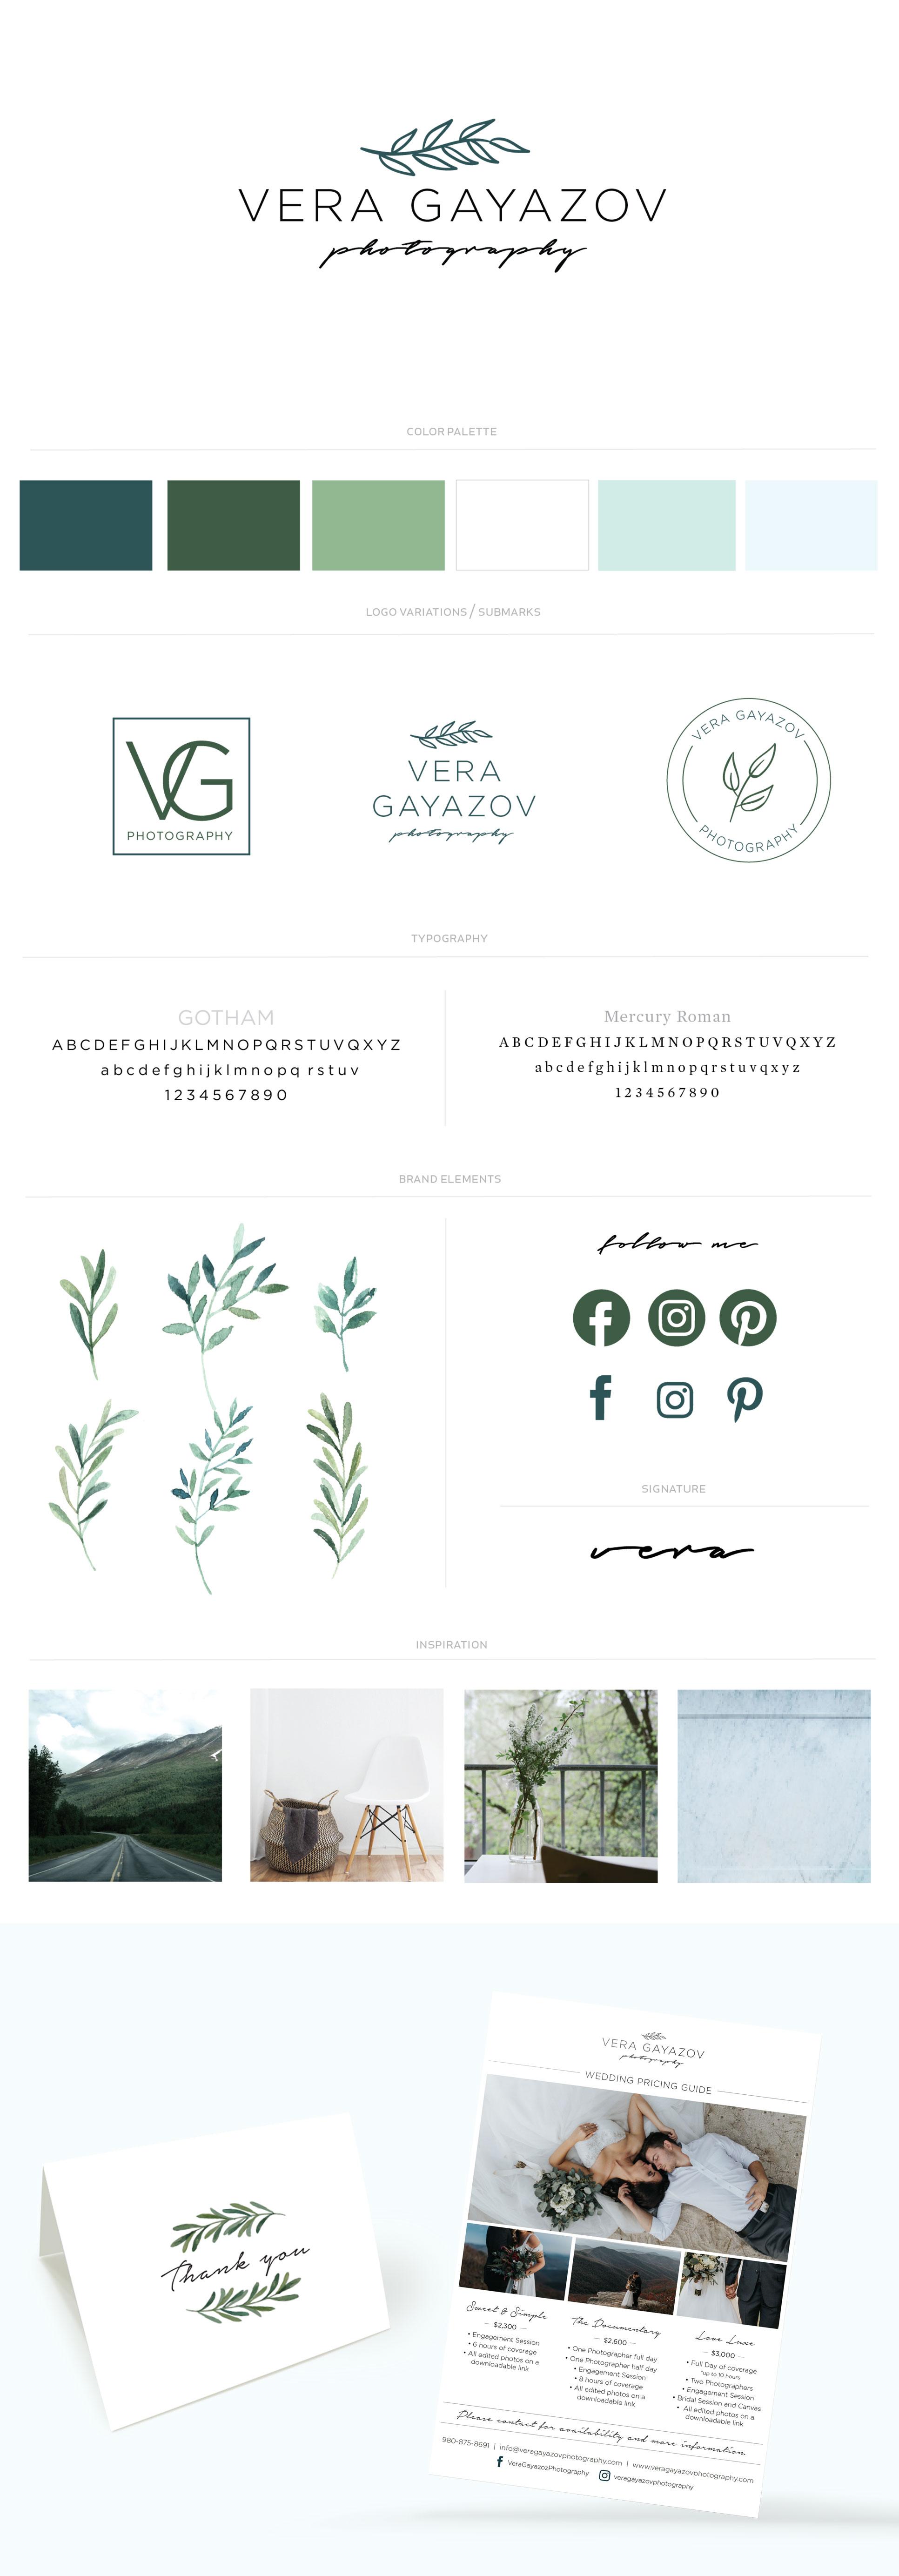 Vera Gayazov Photography | Logo and Branding Design by Callie Cullum